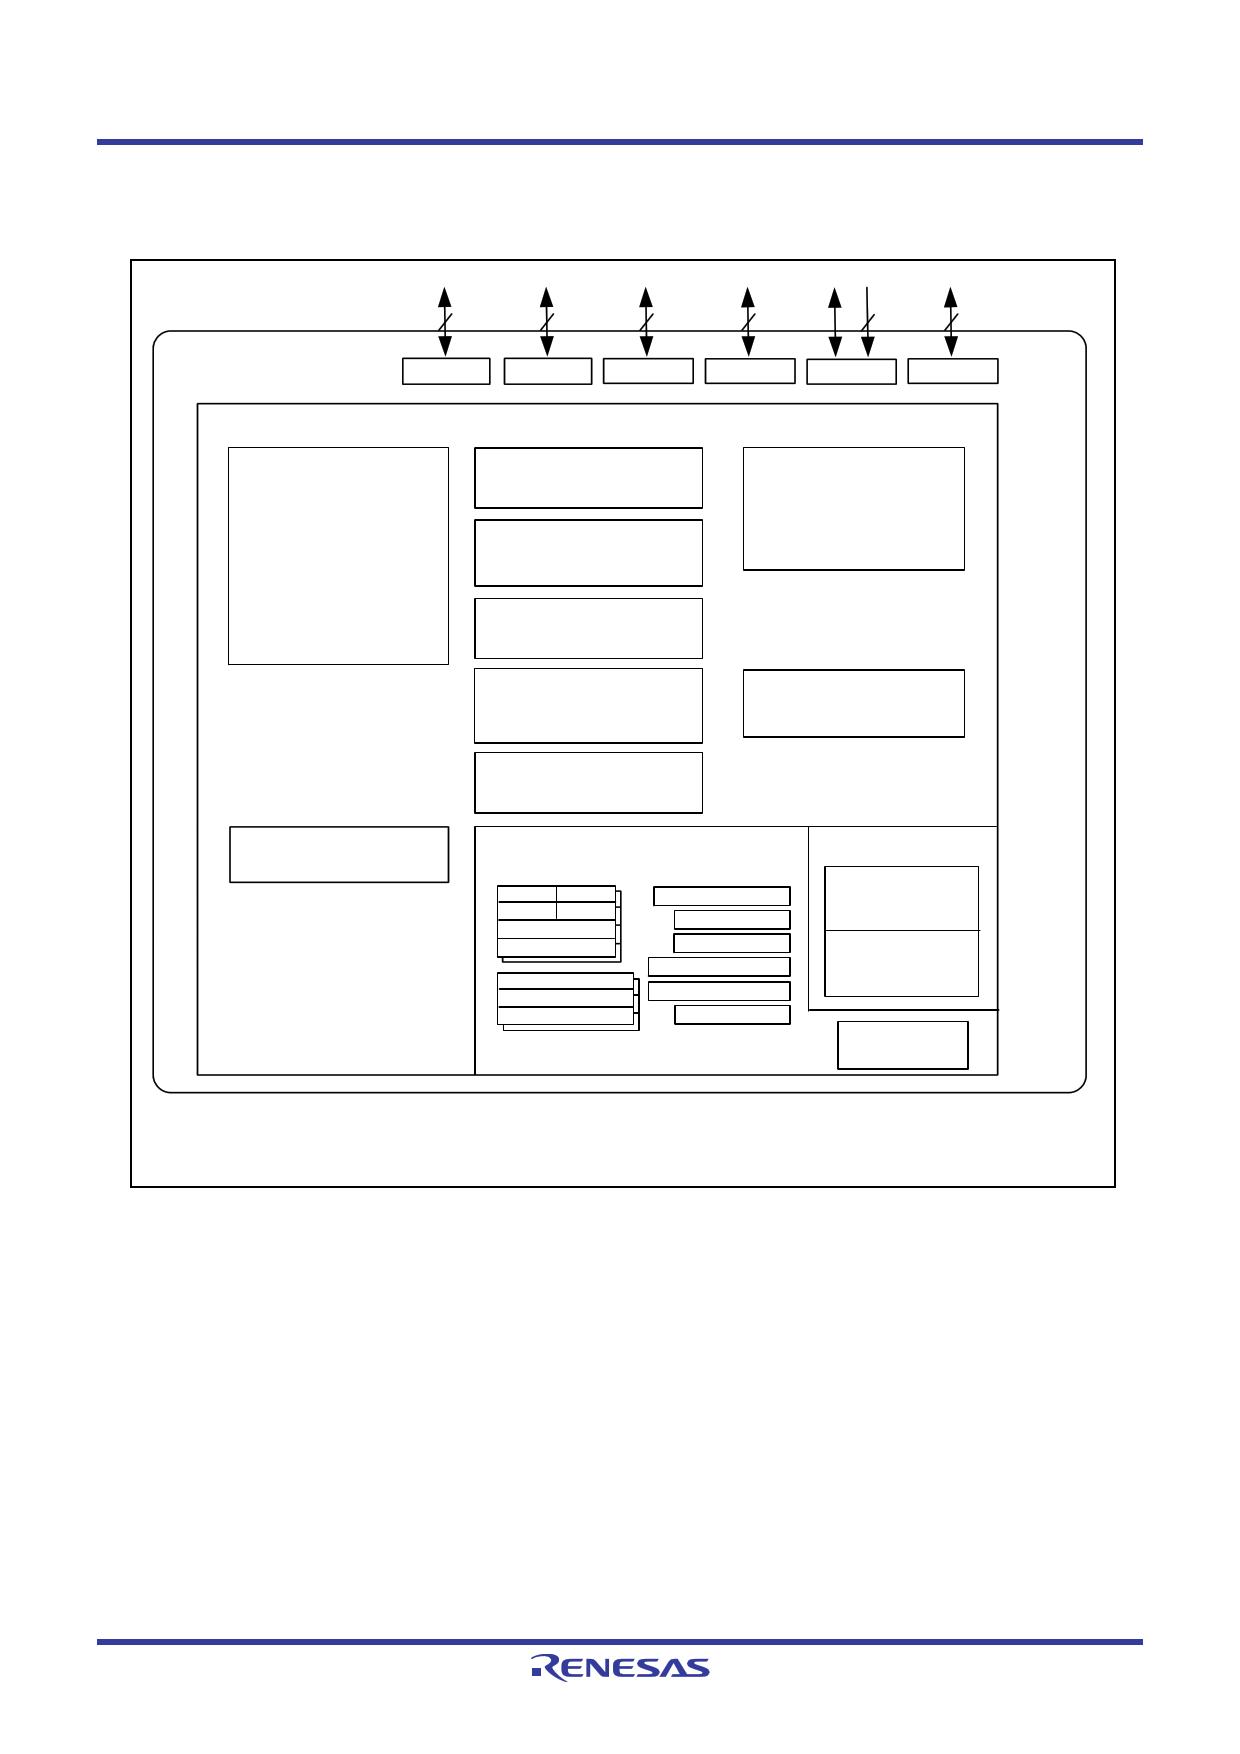 R5F21227JFP pdf, 반도체, 판매, 대치품